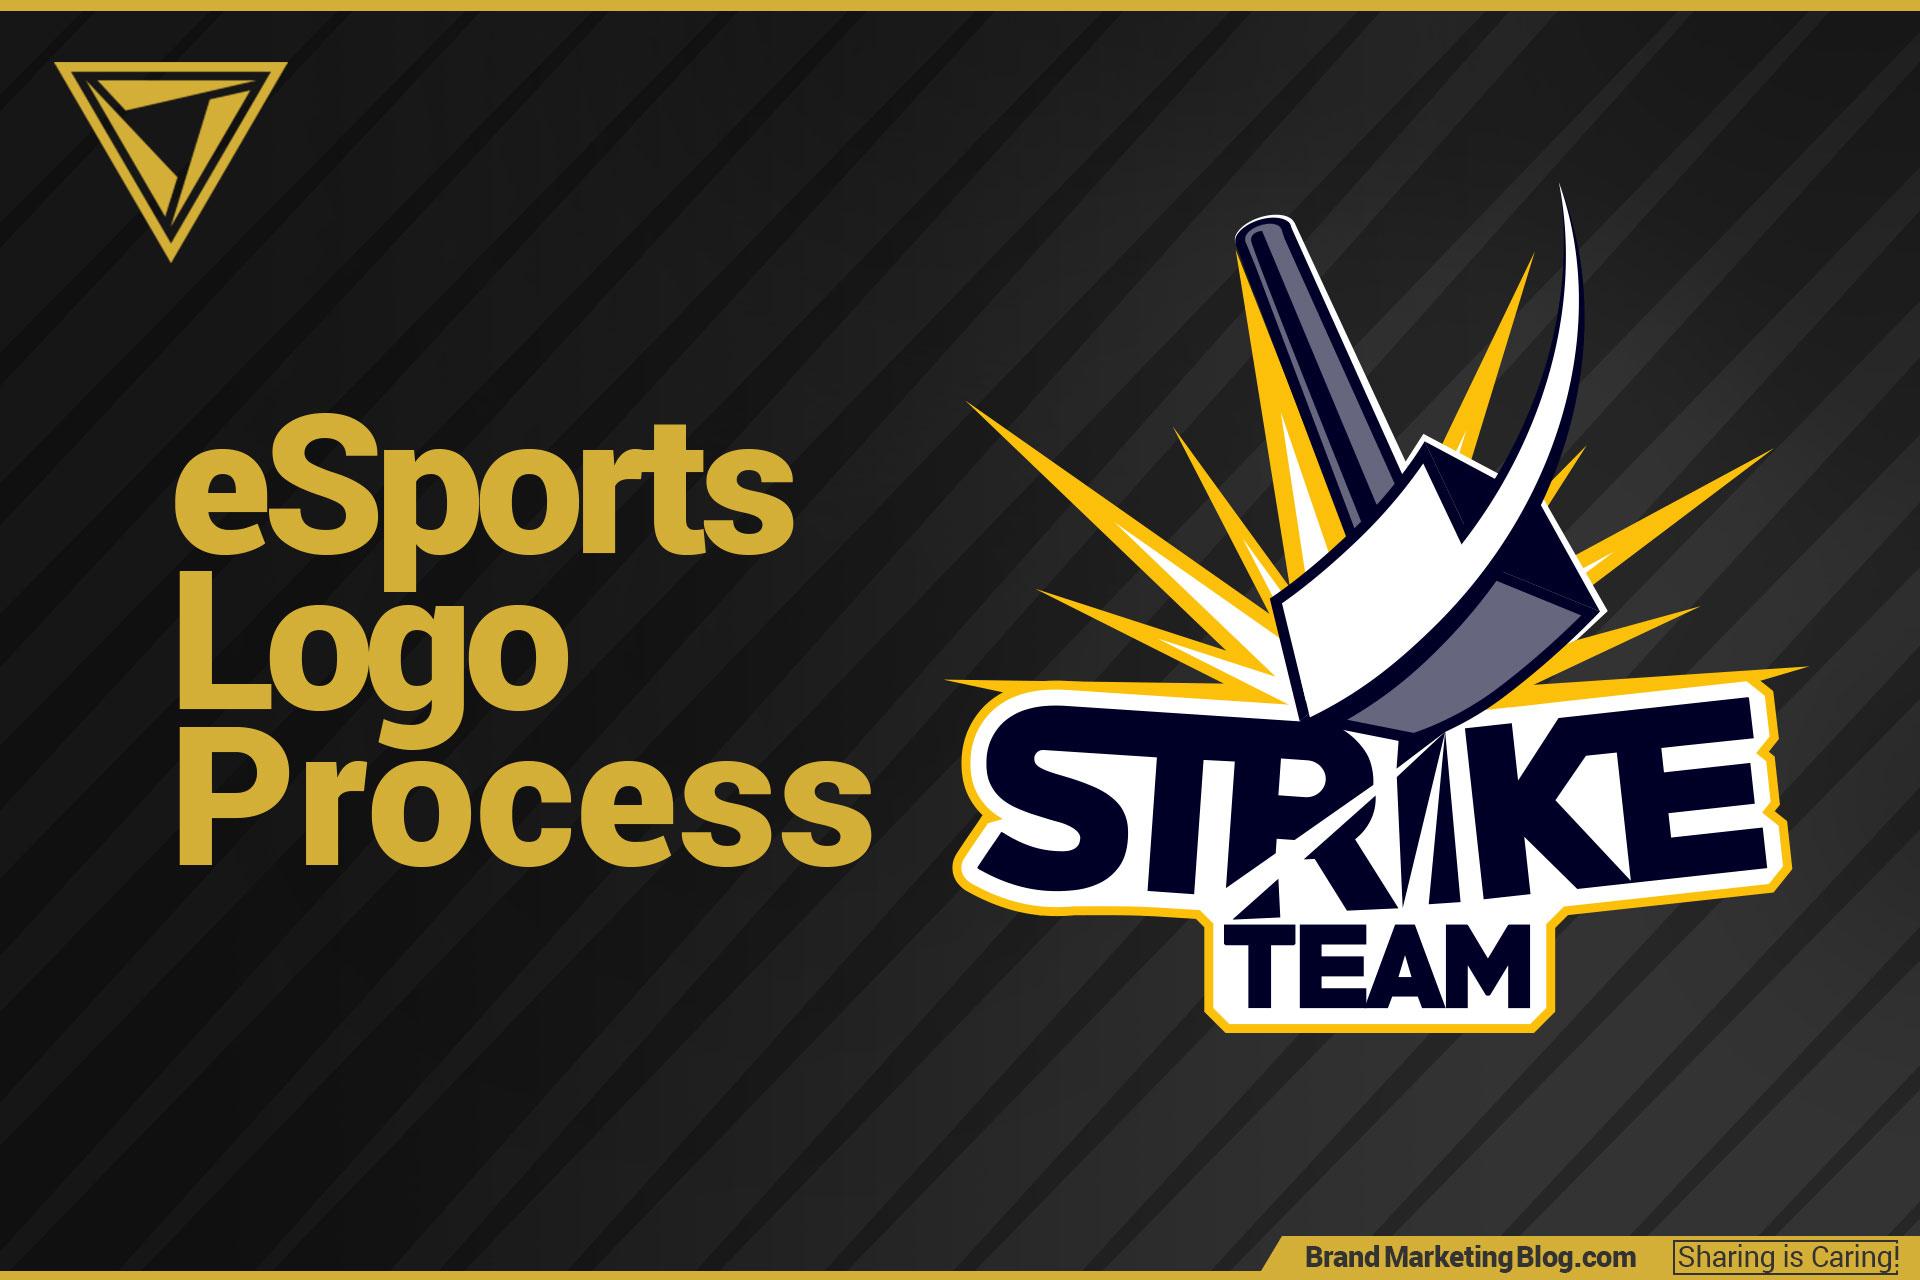 eSports logo process